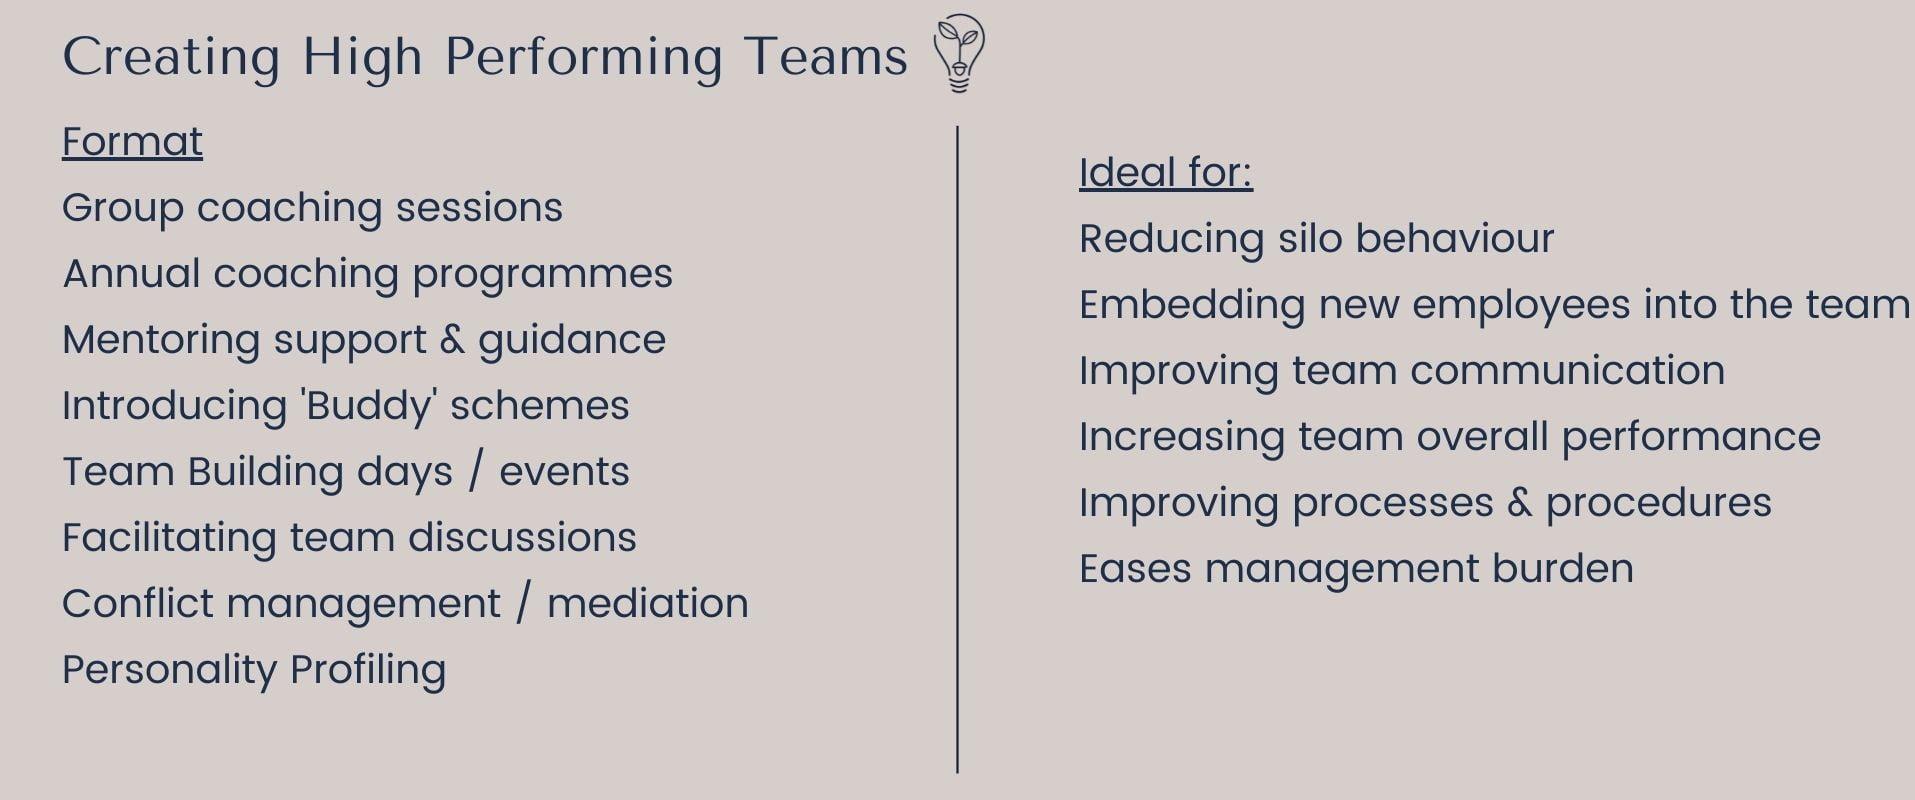 creating high performing teams with eurika